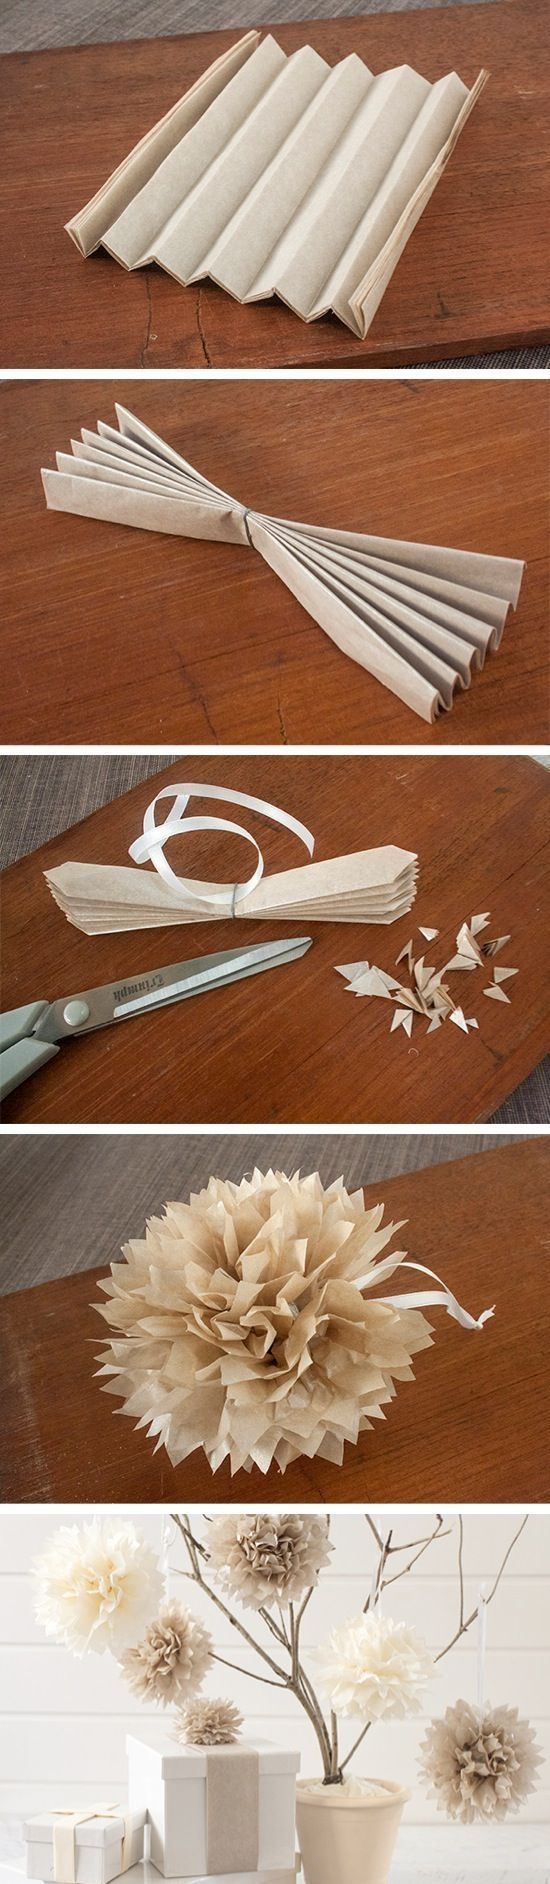 Tissue Paper Pom Poms by Happy Snapz Photography: